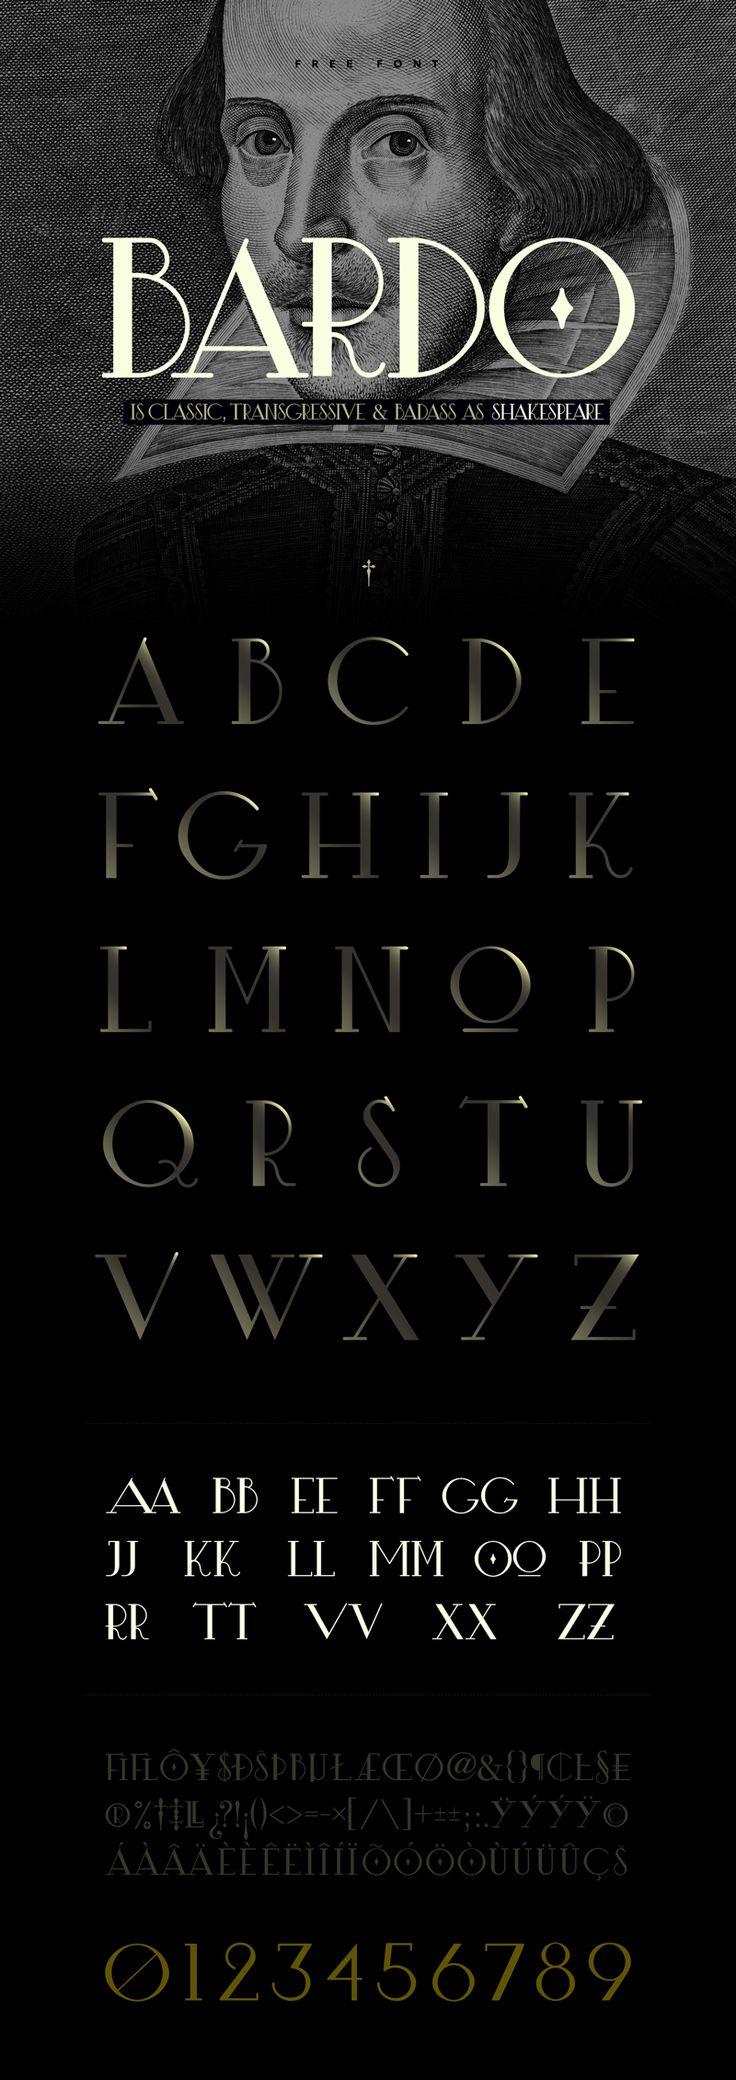 Fresh Free Font Of The Day : Bardo